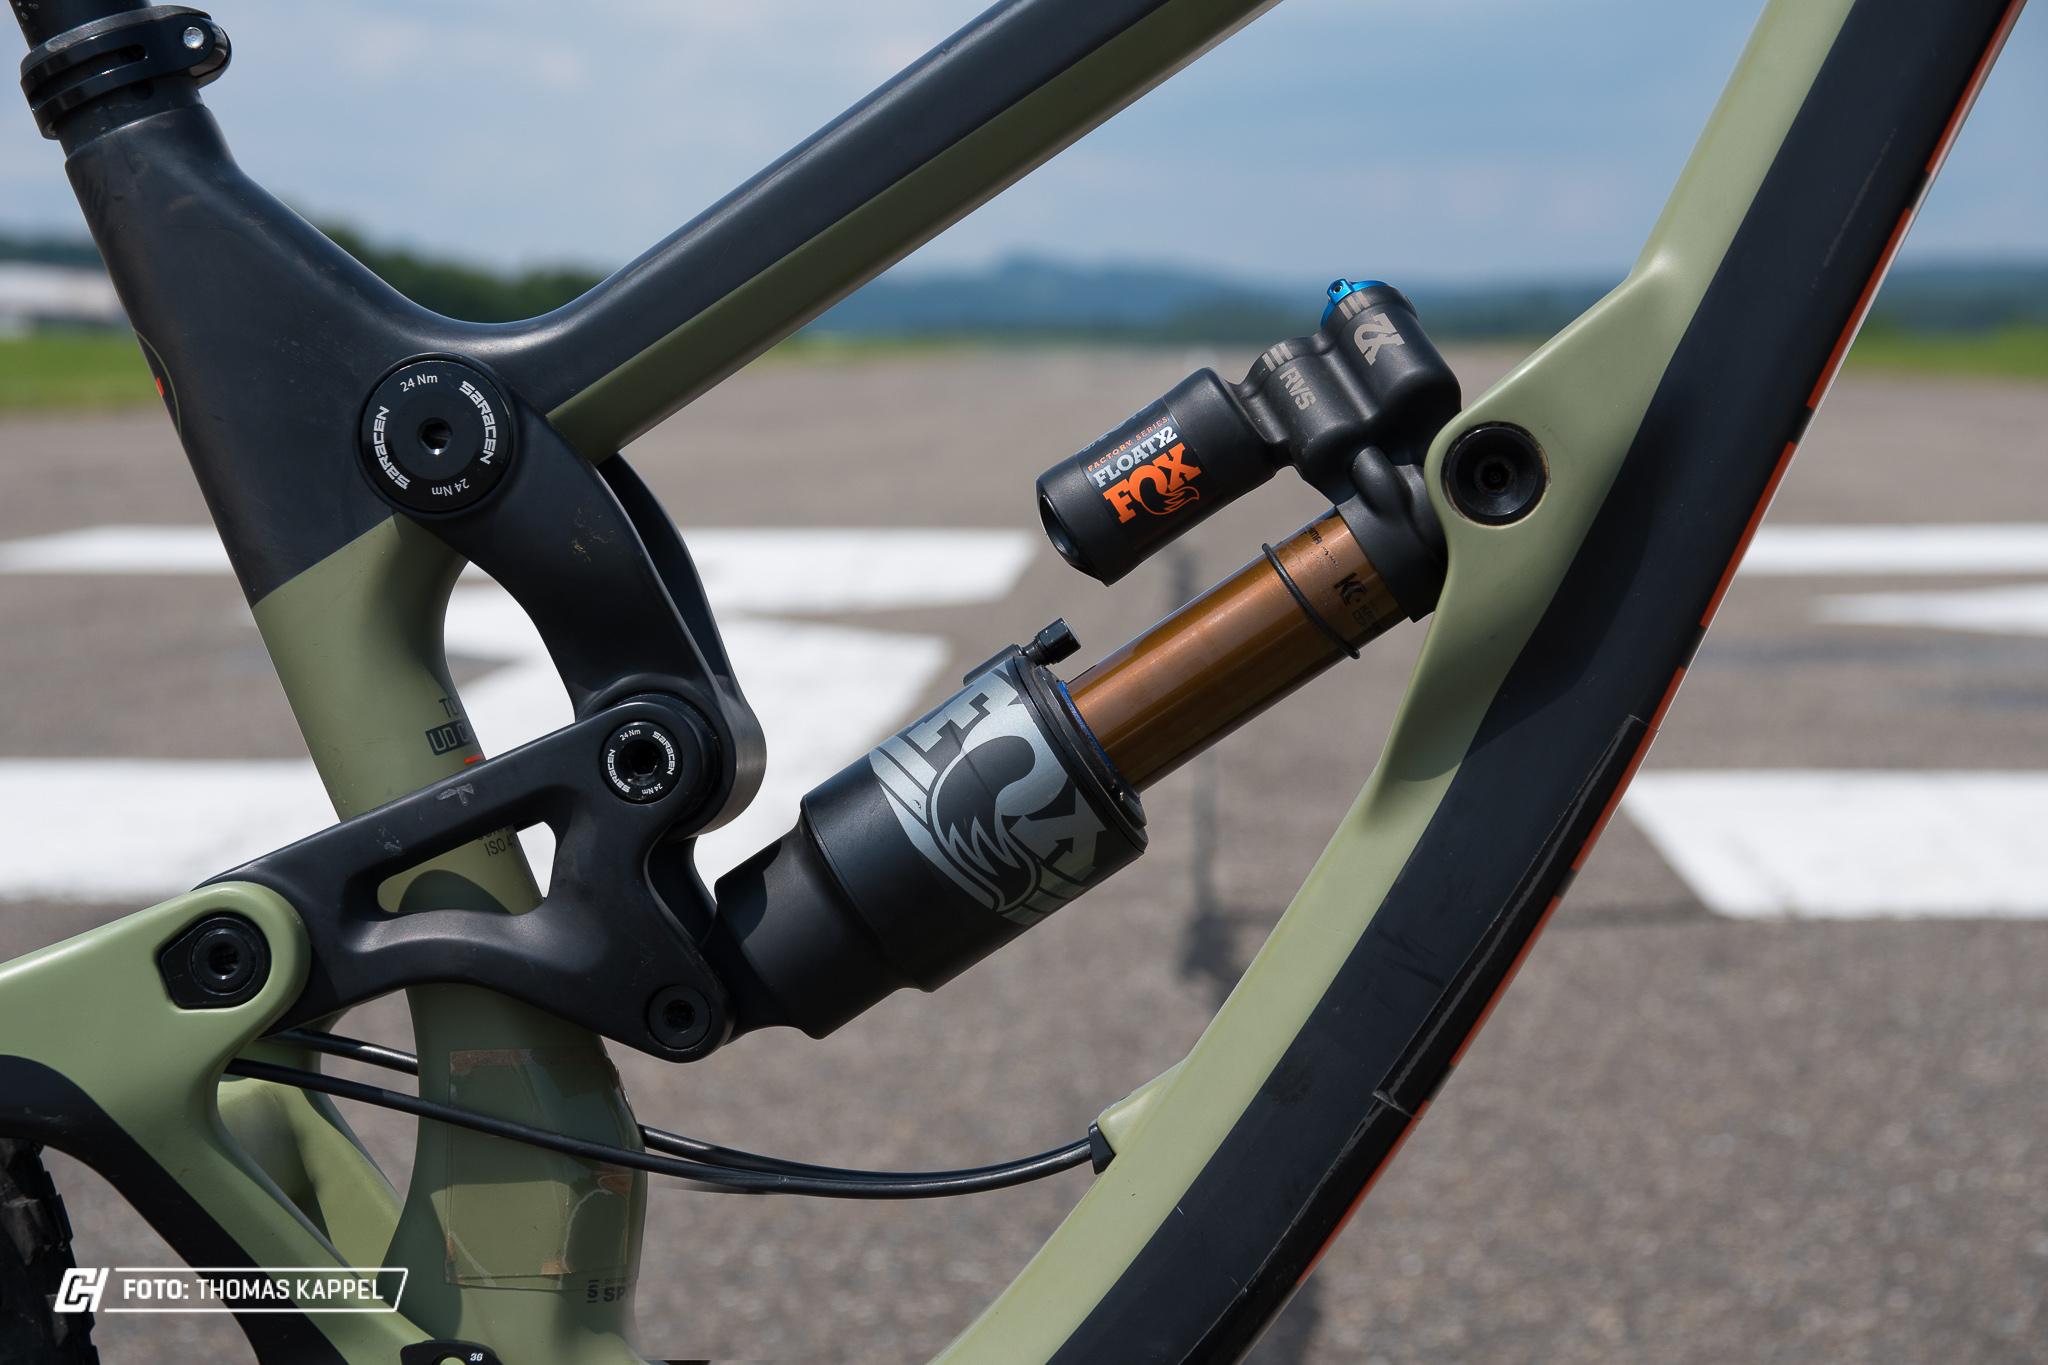 Saracen Bikes